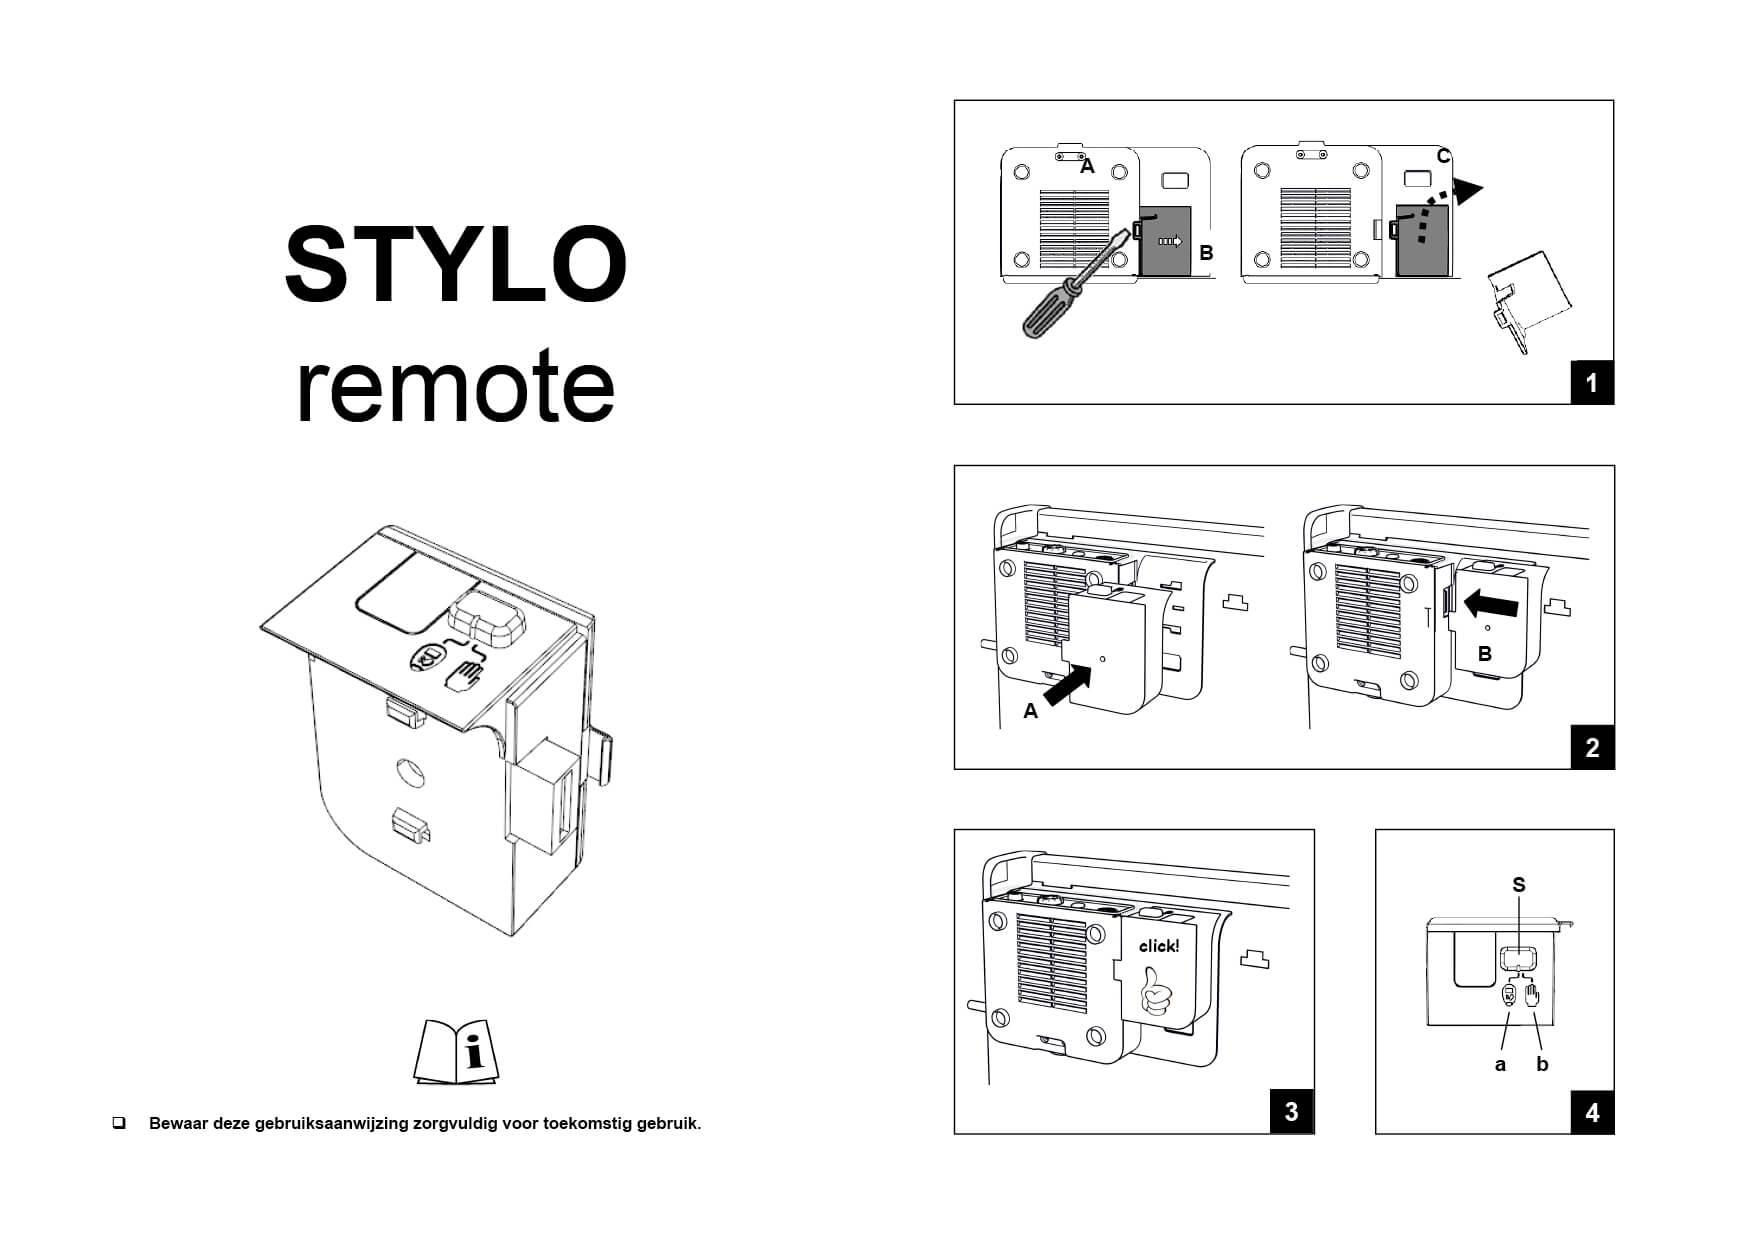 DRL_E-Comfort_Stylo_Remote_Gebruiksinstructie_Ned